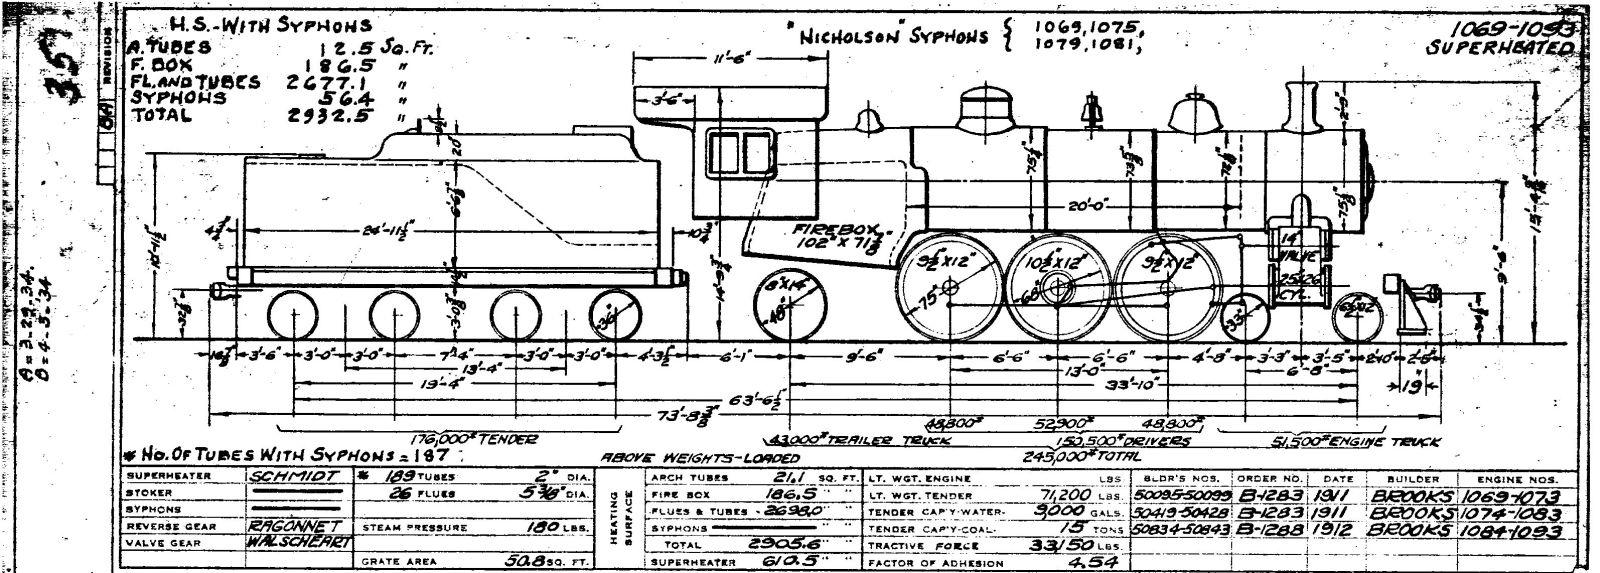 Illinois Central 1937 Locomotive Diagrams Art Train Engine Diagram 30 1302 31 Locomotives 1310 1312 32 1501 1550 33 1551 1599 34 35 1598